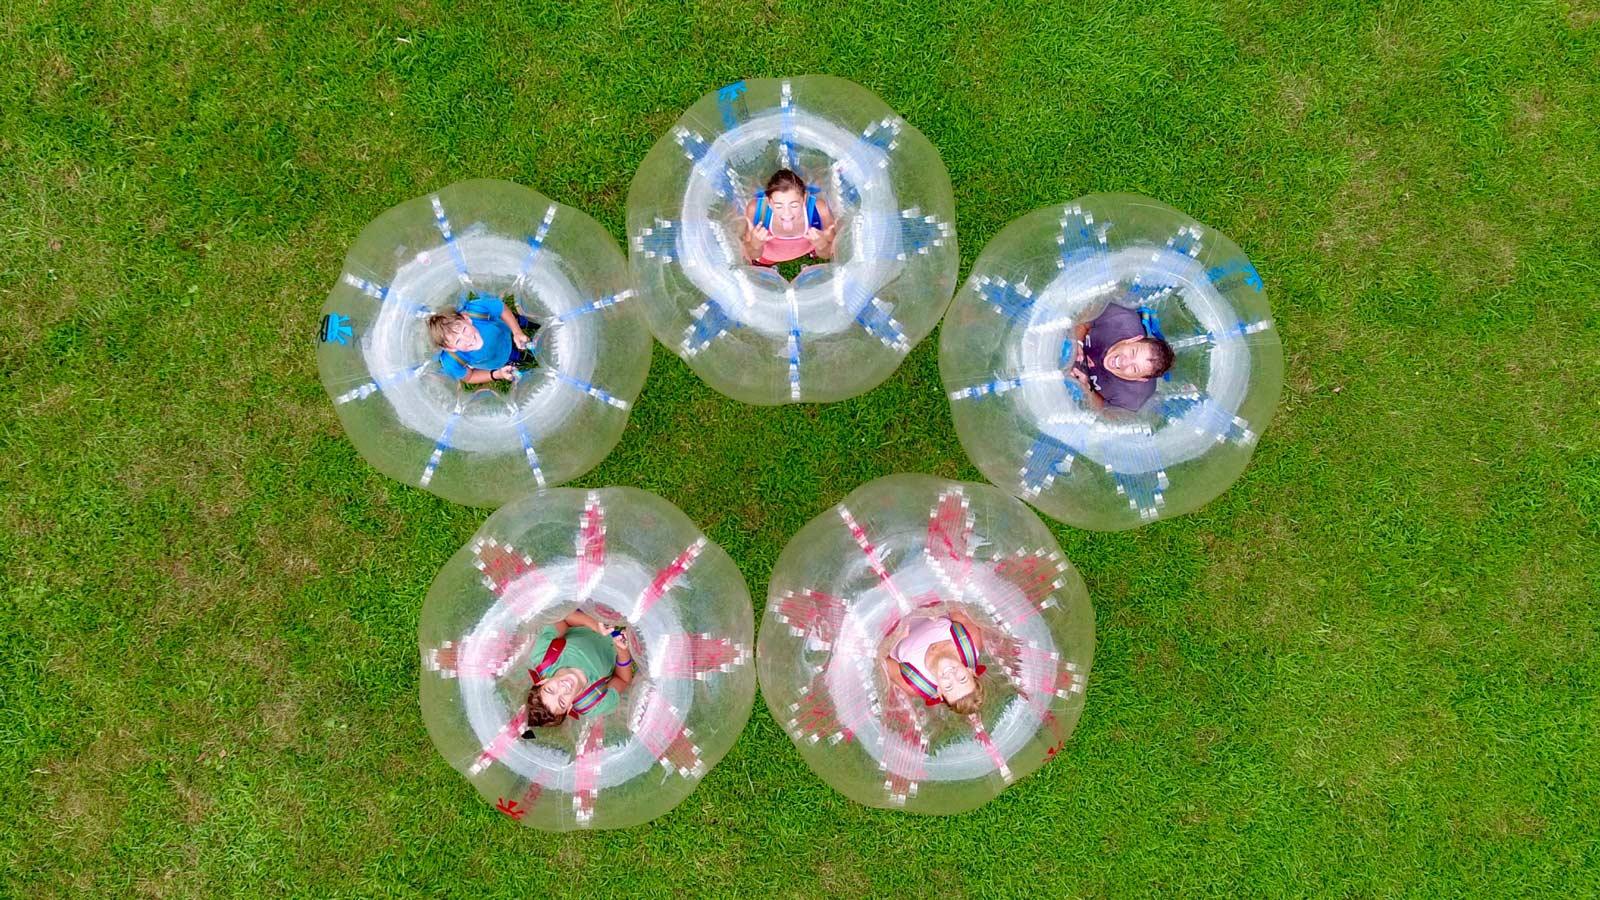 BubbleBall Maryland Birthday Party